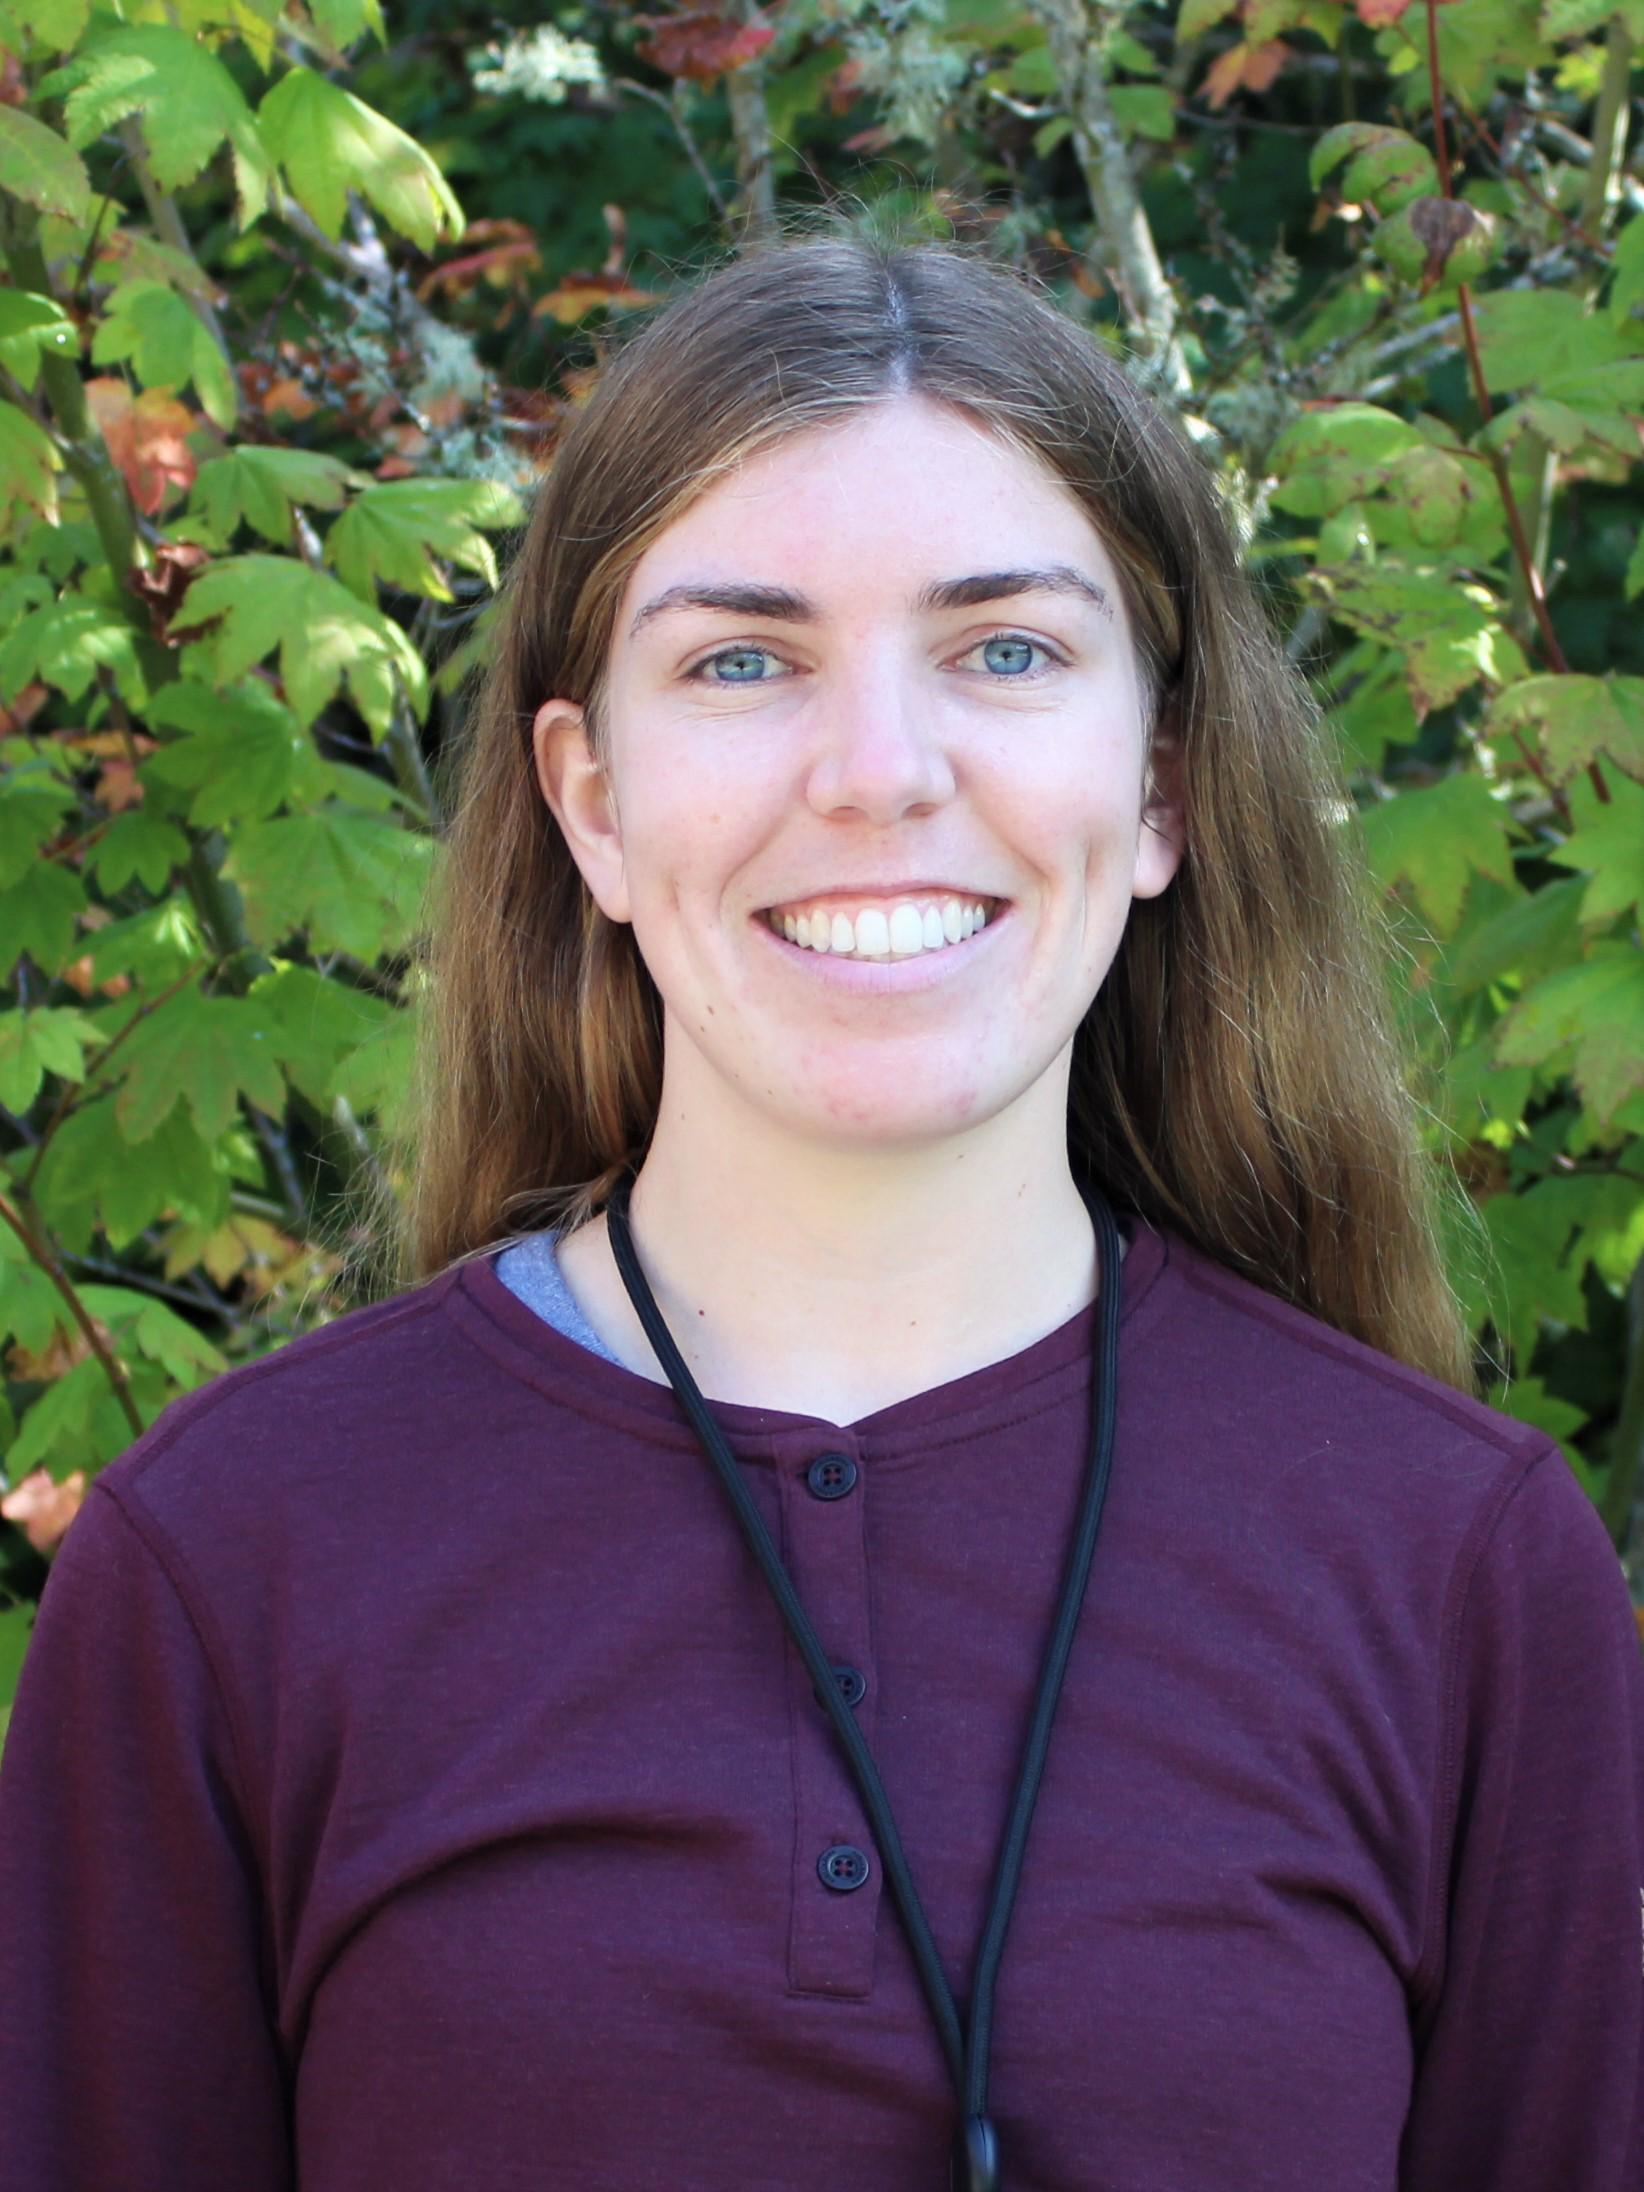 IslandWood Graduate Program student Natalie Lassiter